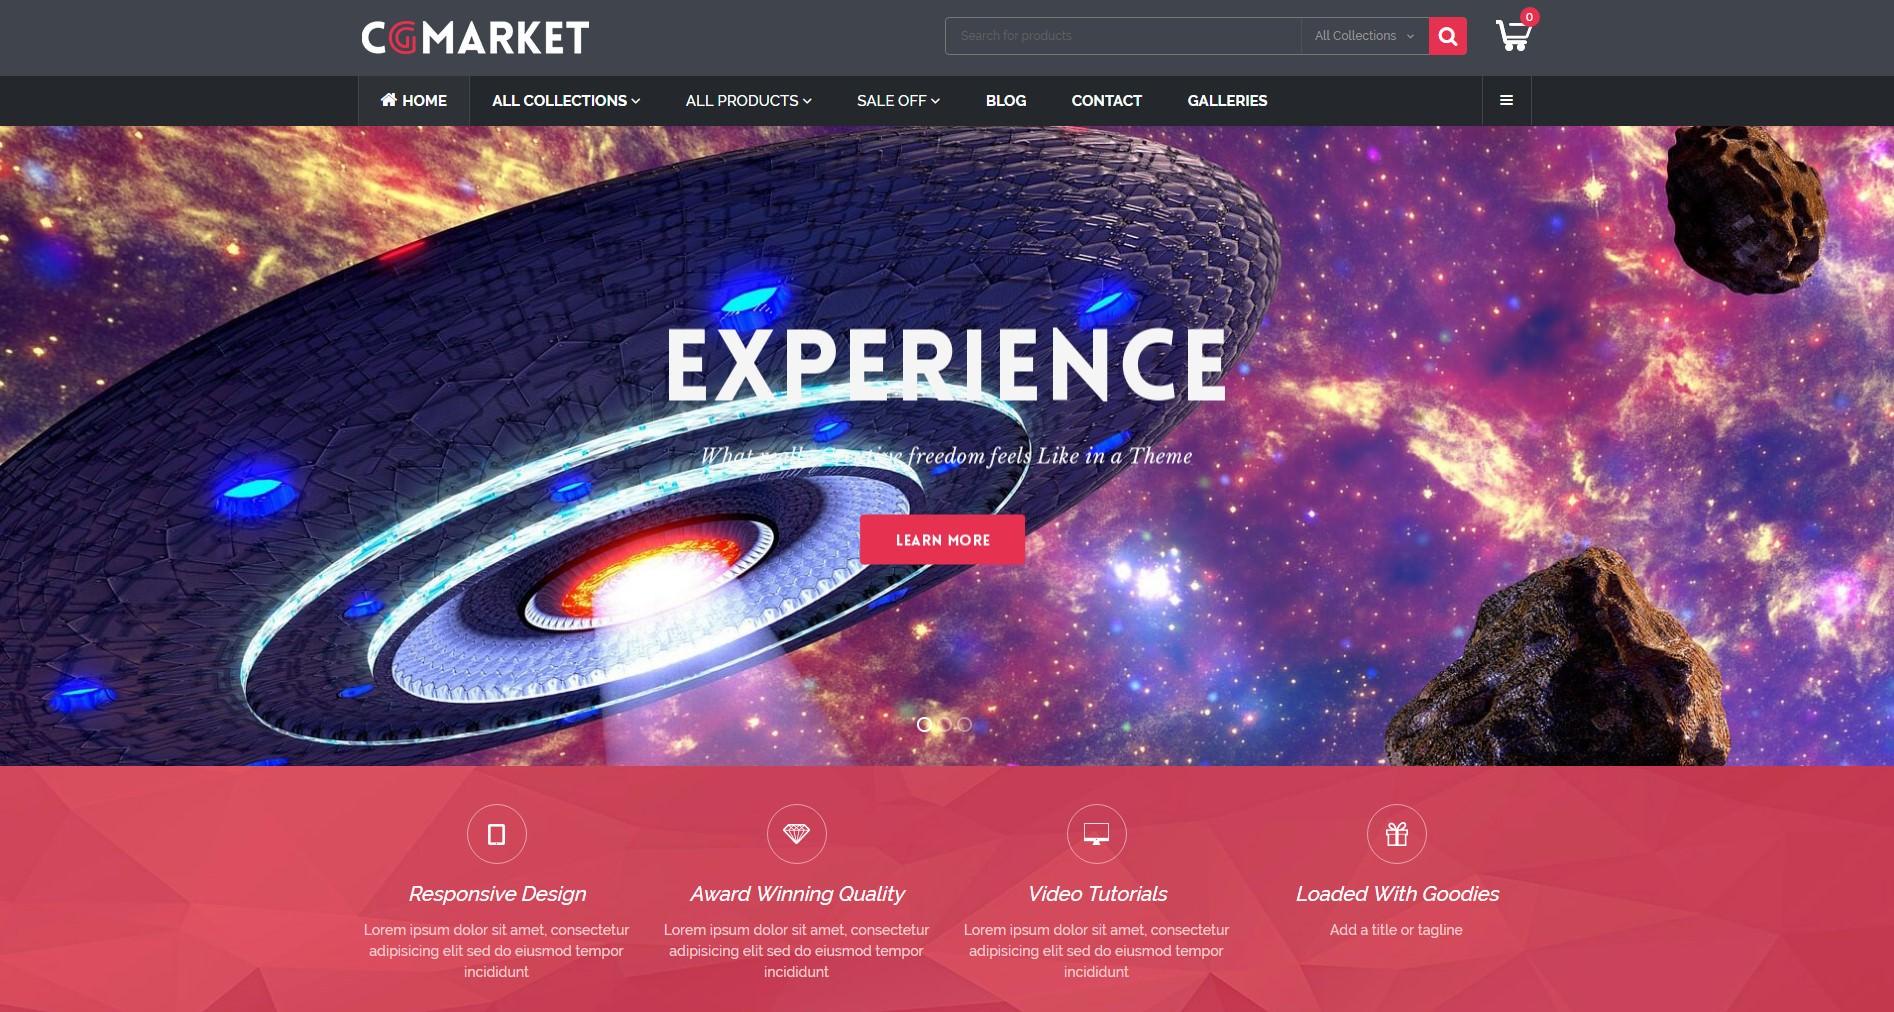 CGMarket theme